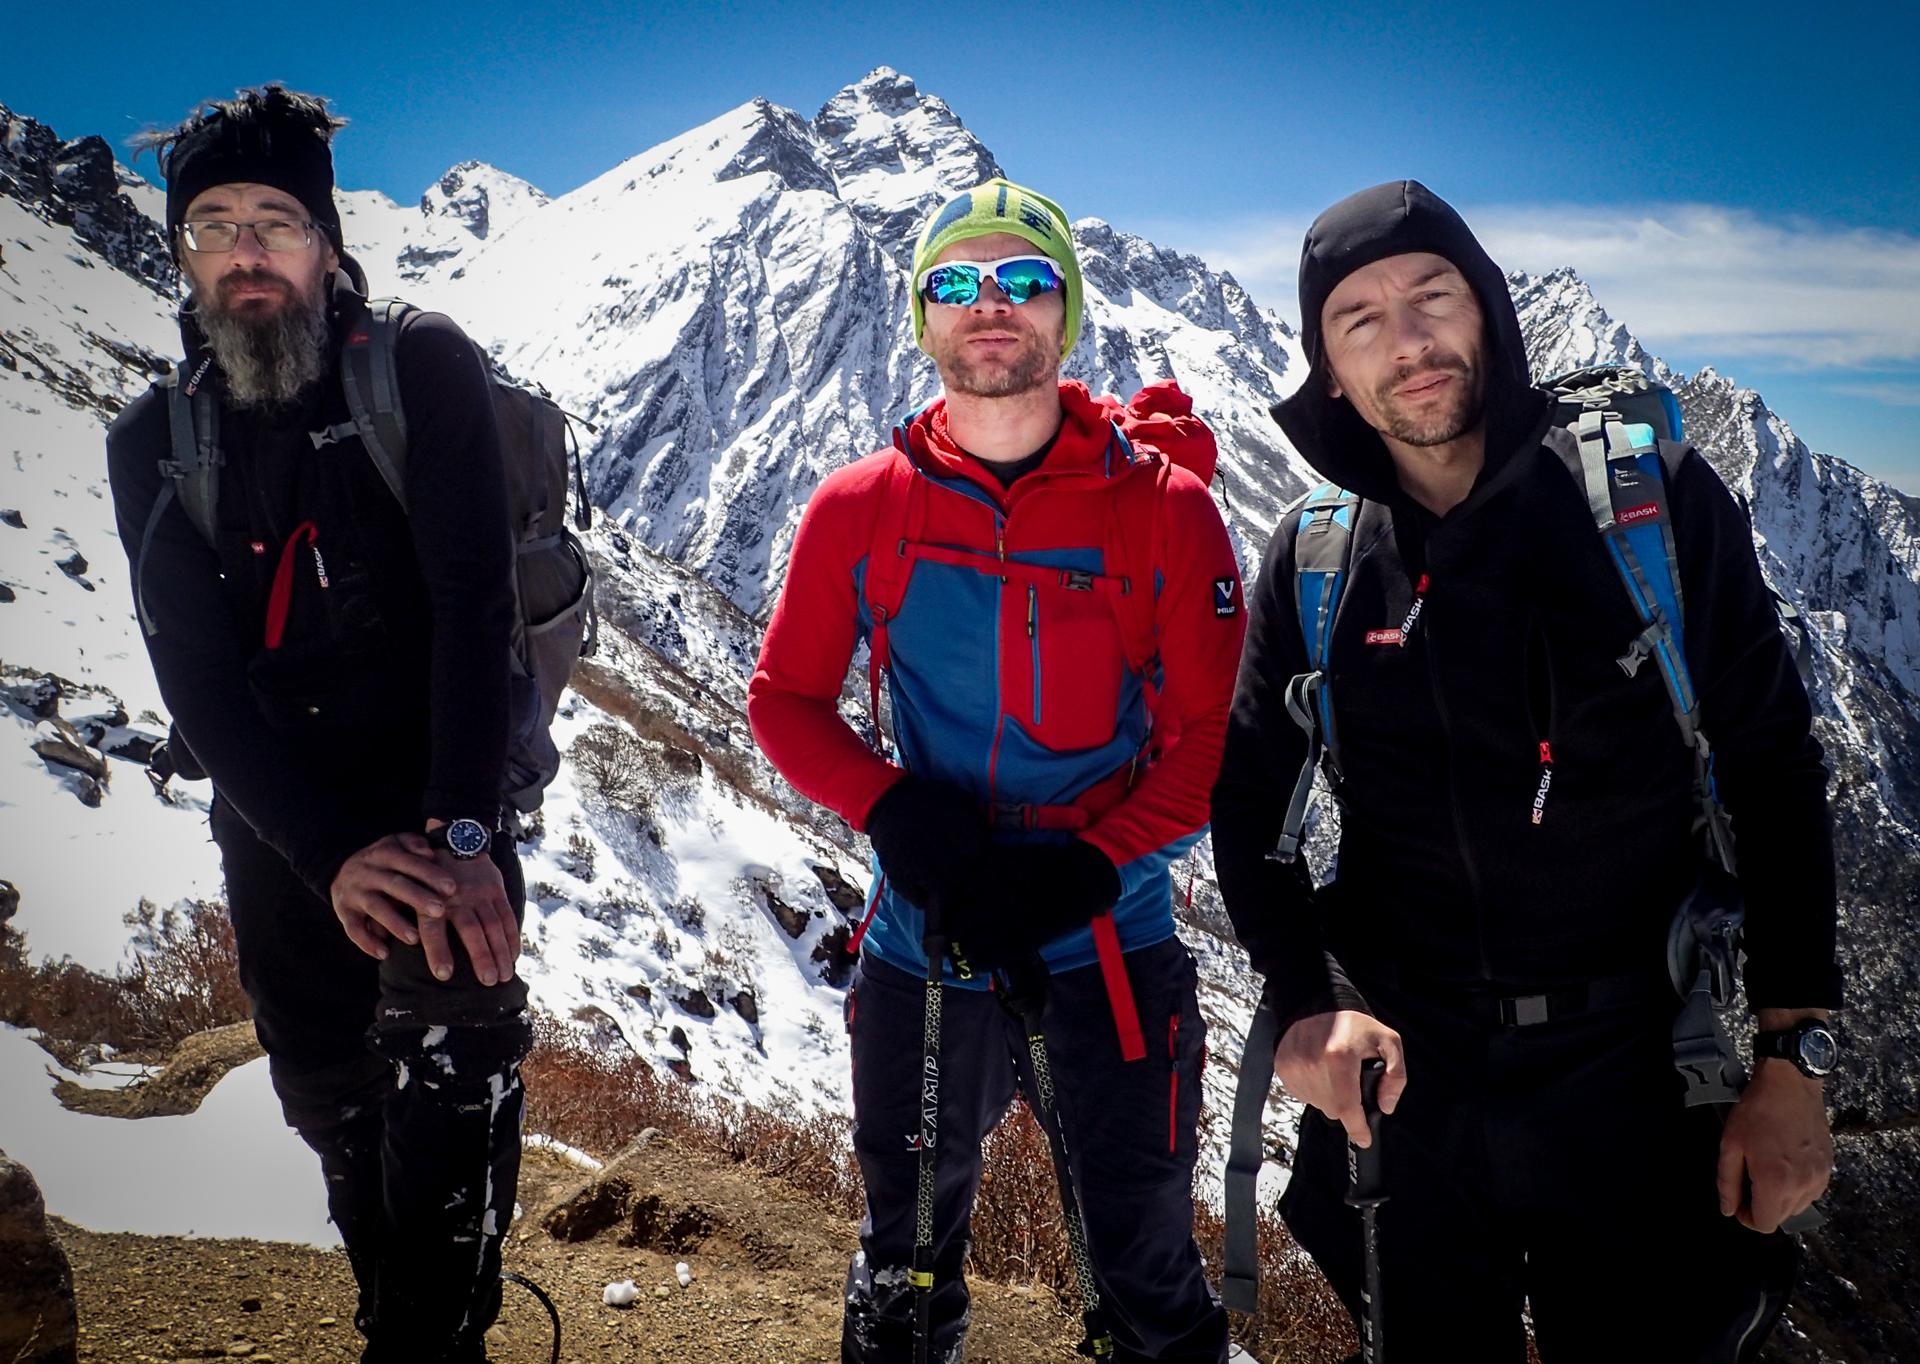 Sergey Nilov, Marcin Tomaszewski, Dimitri Golovchenko